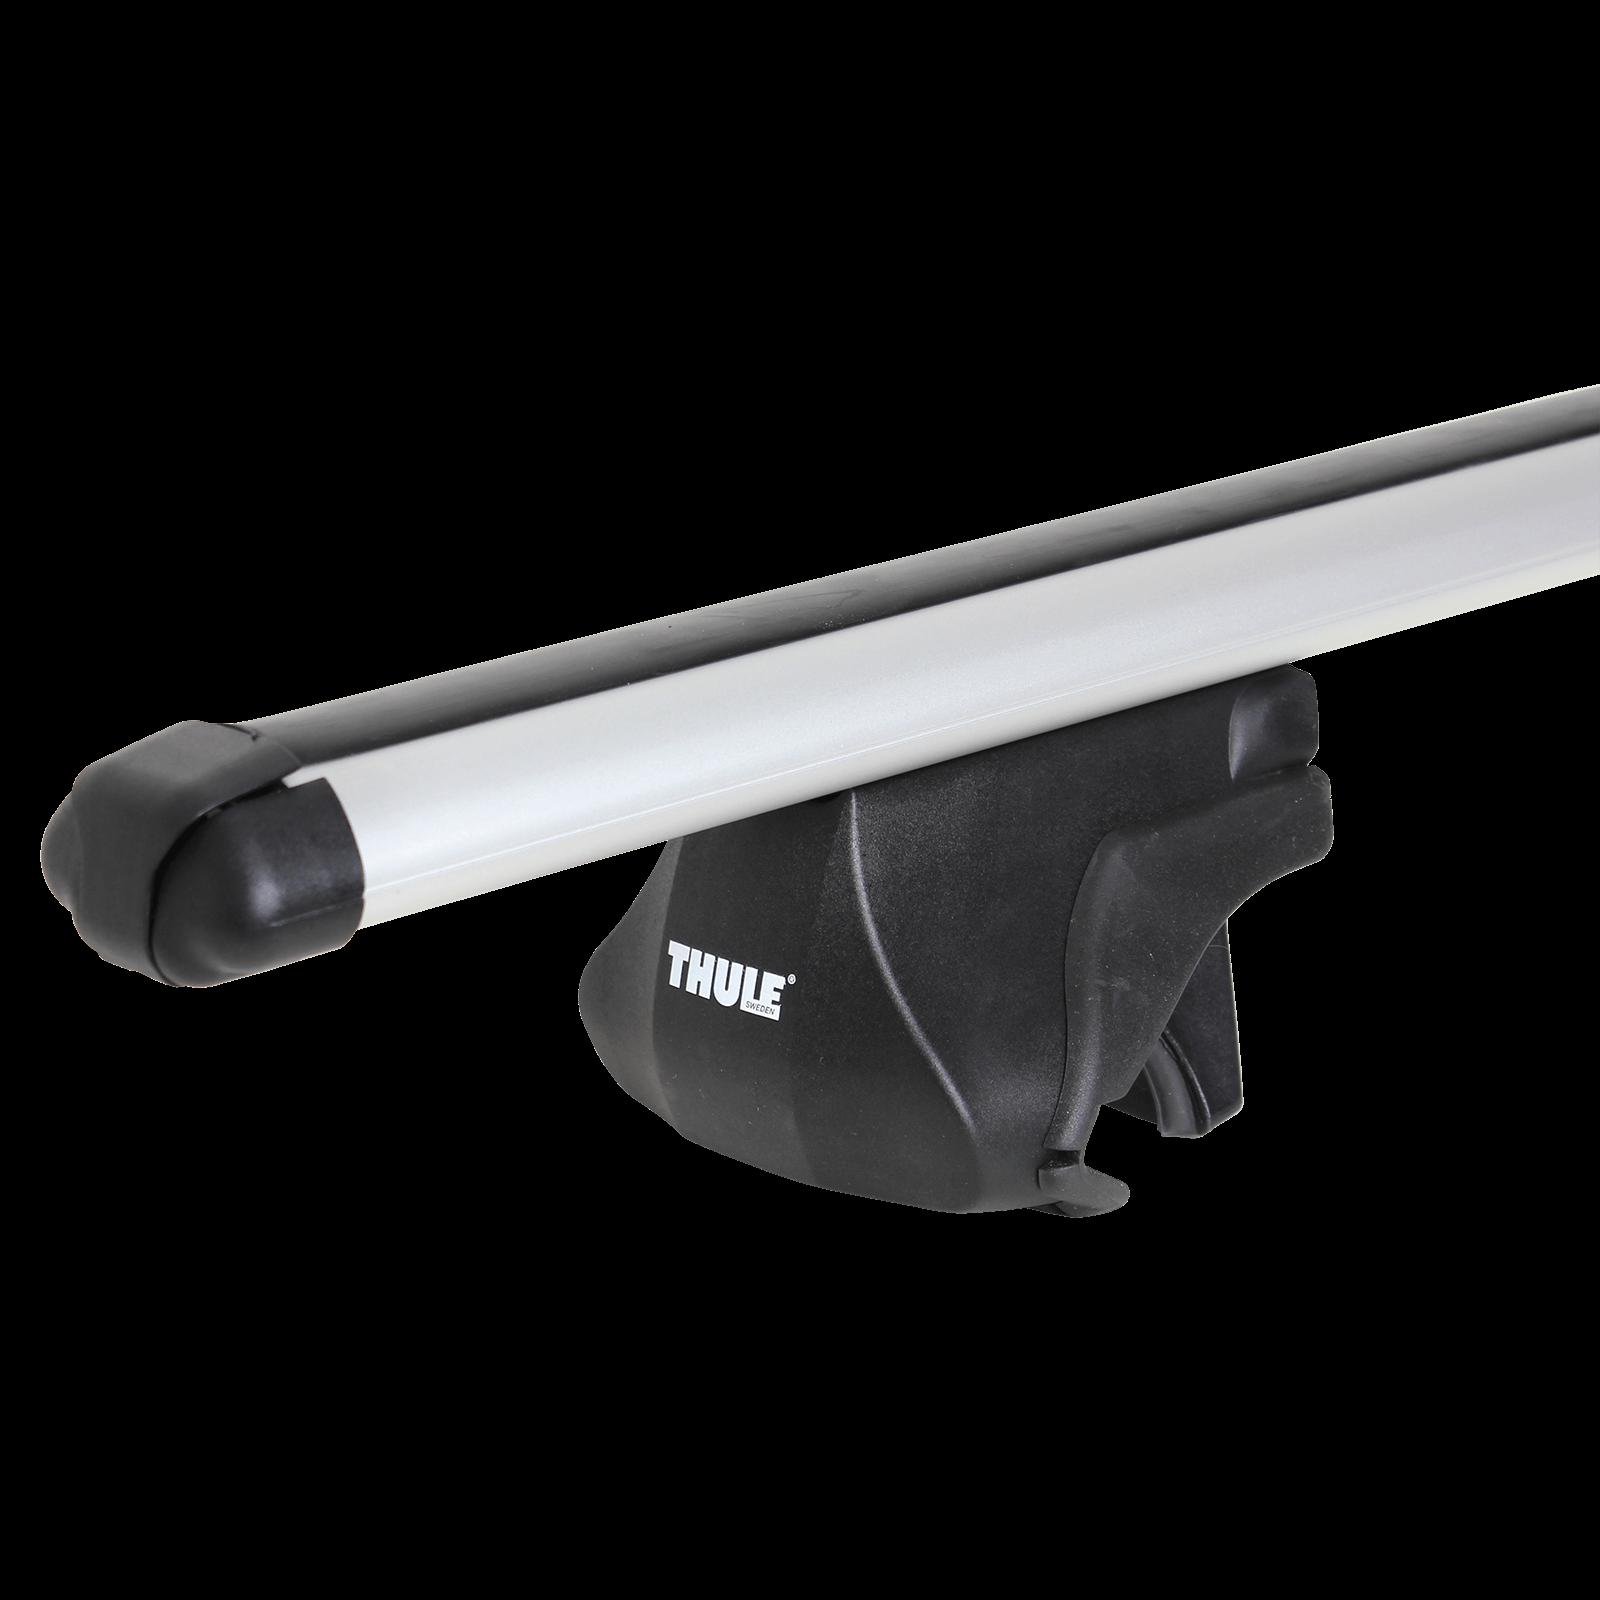 barre de toit thule smartrack volvo xc90 i bj rameder barres de toit. Black Bedroom Furniture Sets. Home Design Ideas